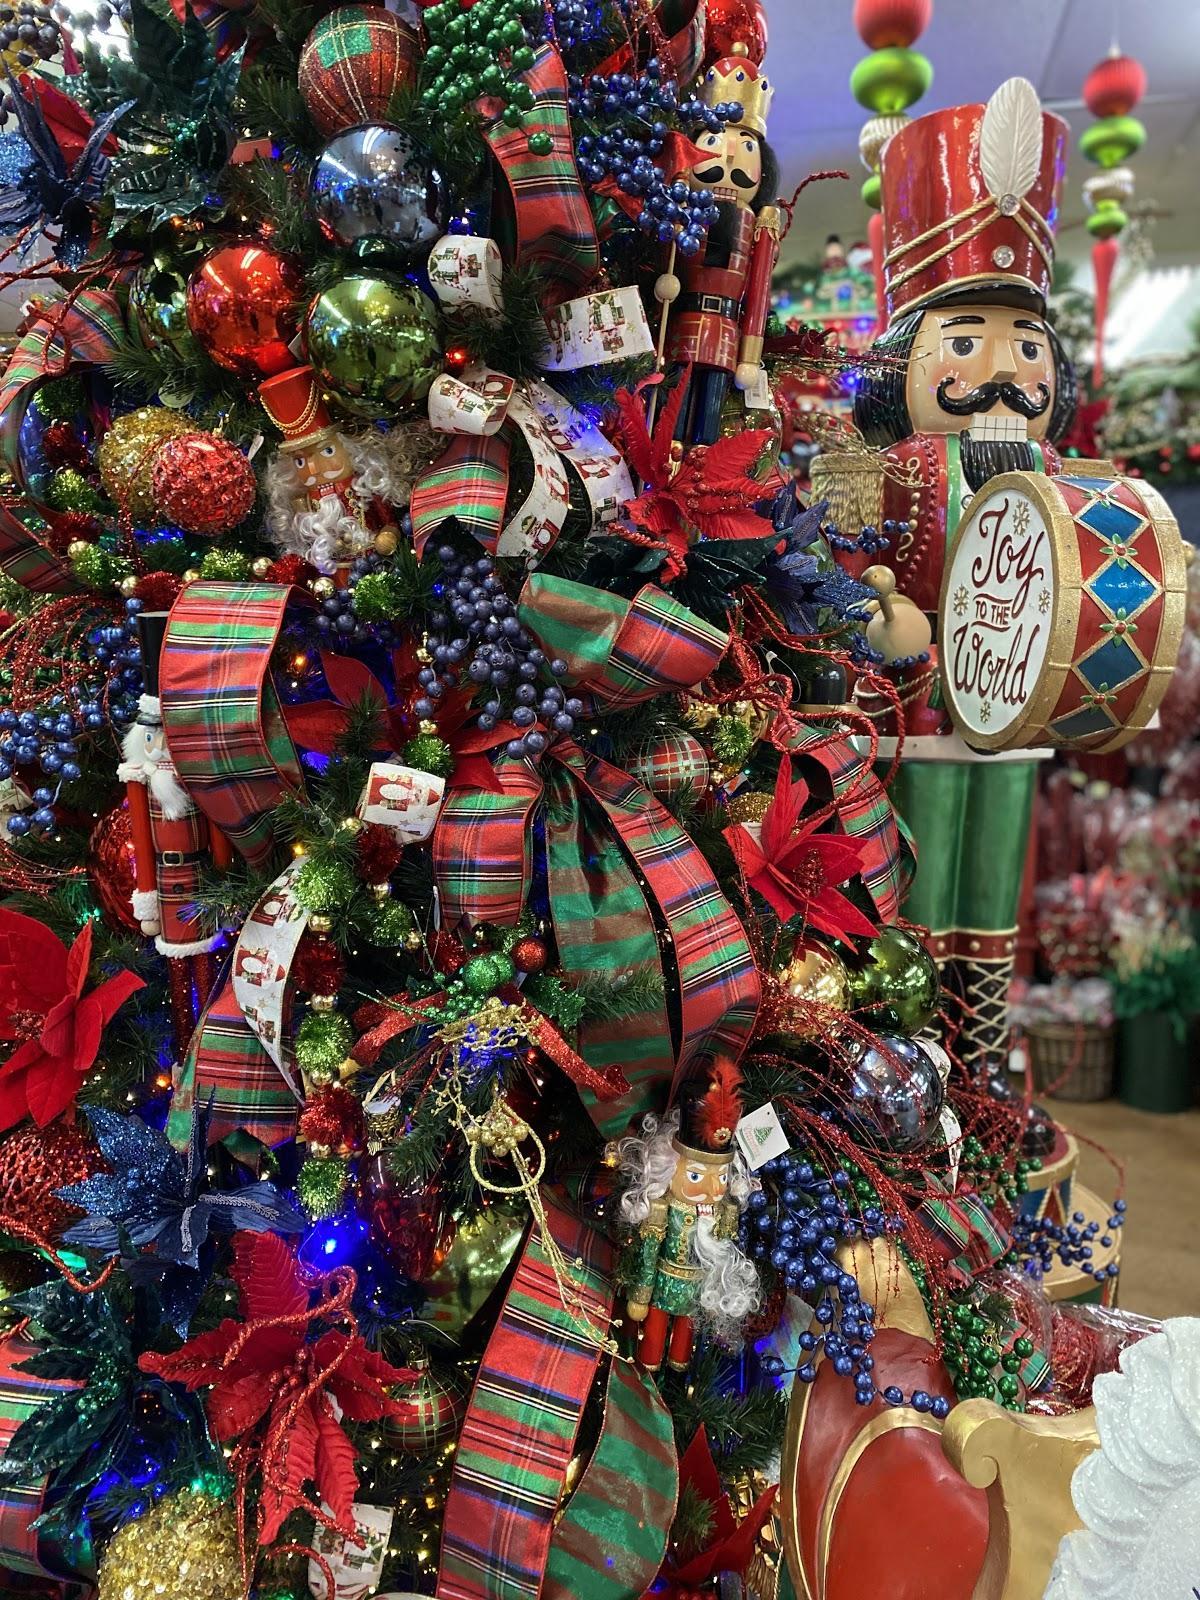 Christmas Decorating Trends 2020: Nutcracker χριστουγεννιάτικος στολισμός στο χριστουγεννιάτικο δέντρο!